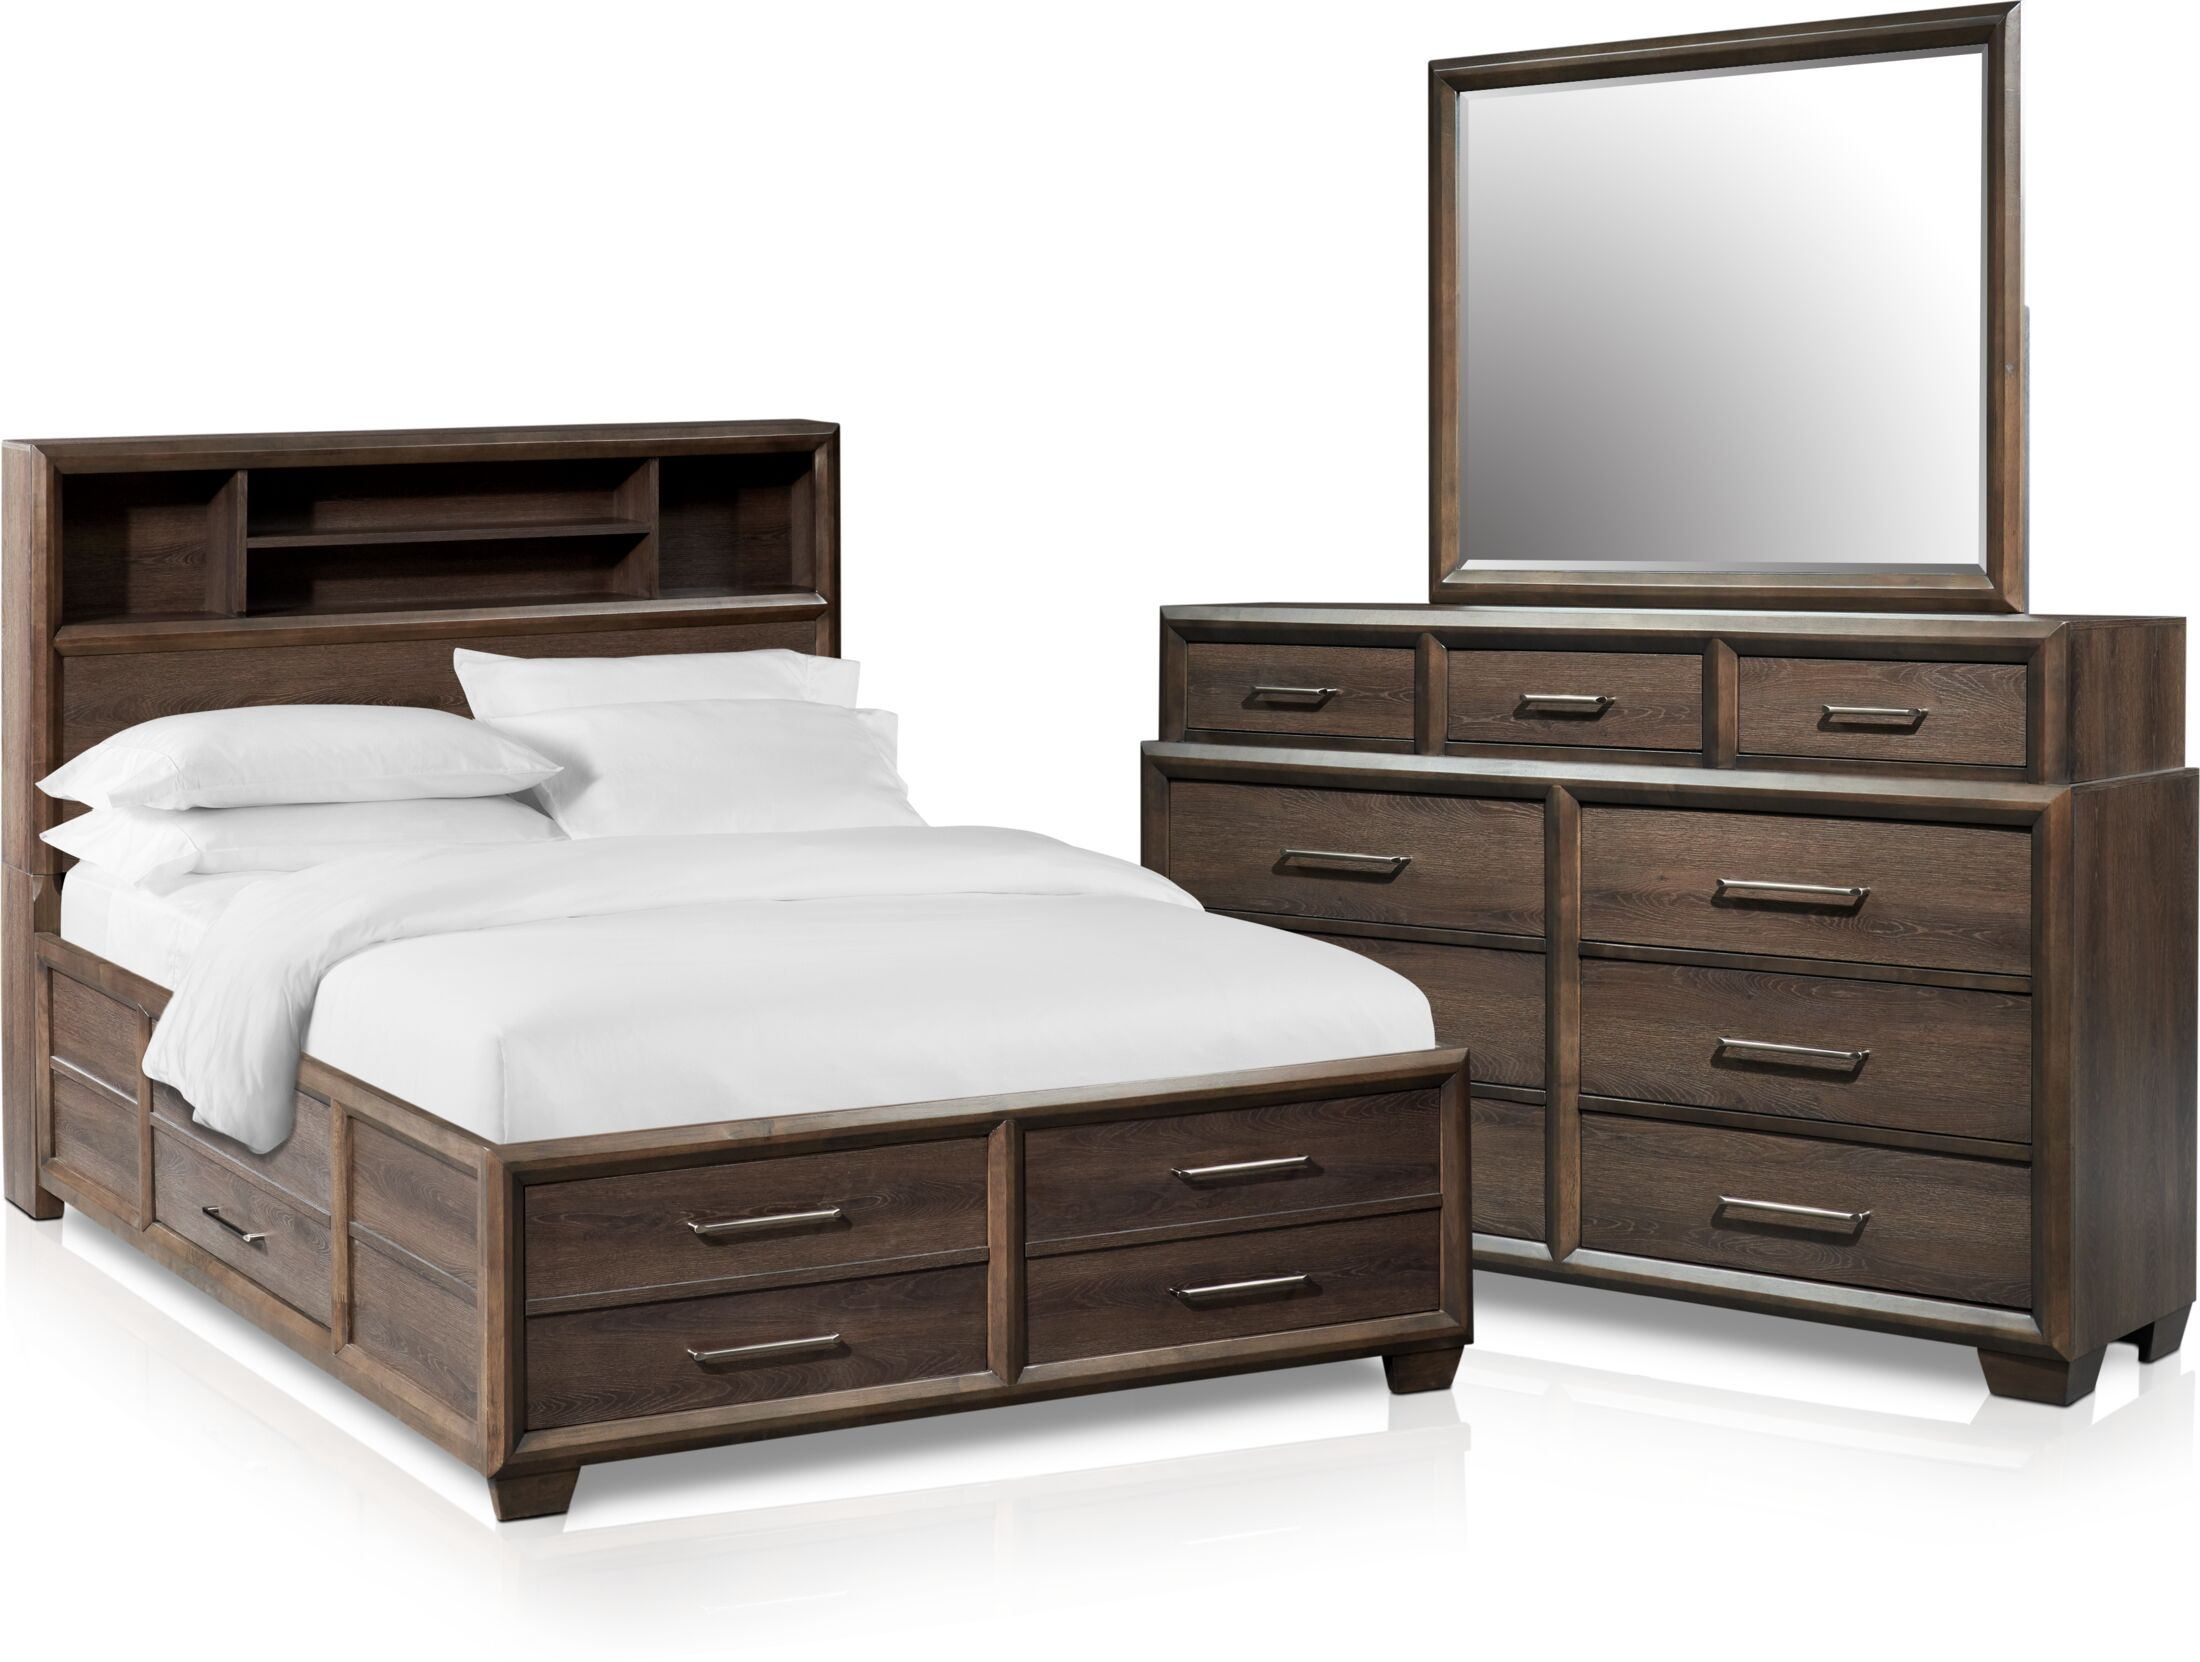 Bedroom Furniture - Dakota 5-Piece Bookcase Storage Bedroom Set with Dresser and Mirror